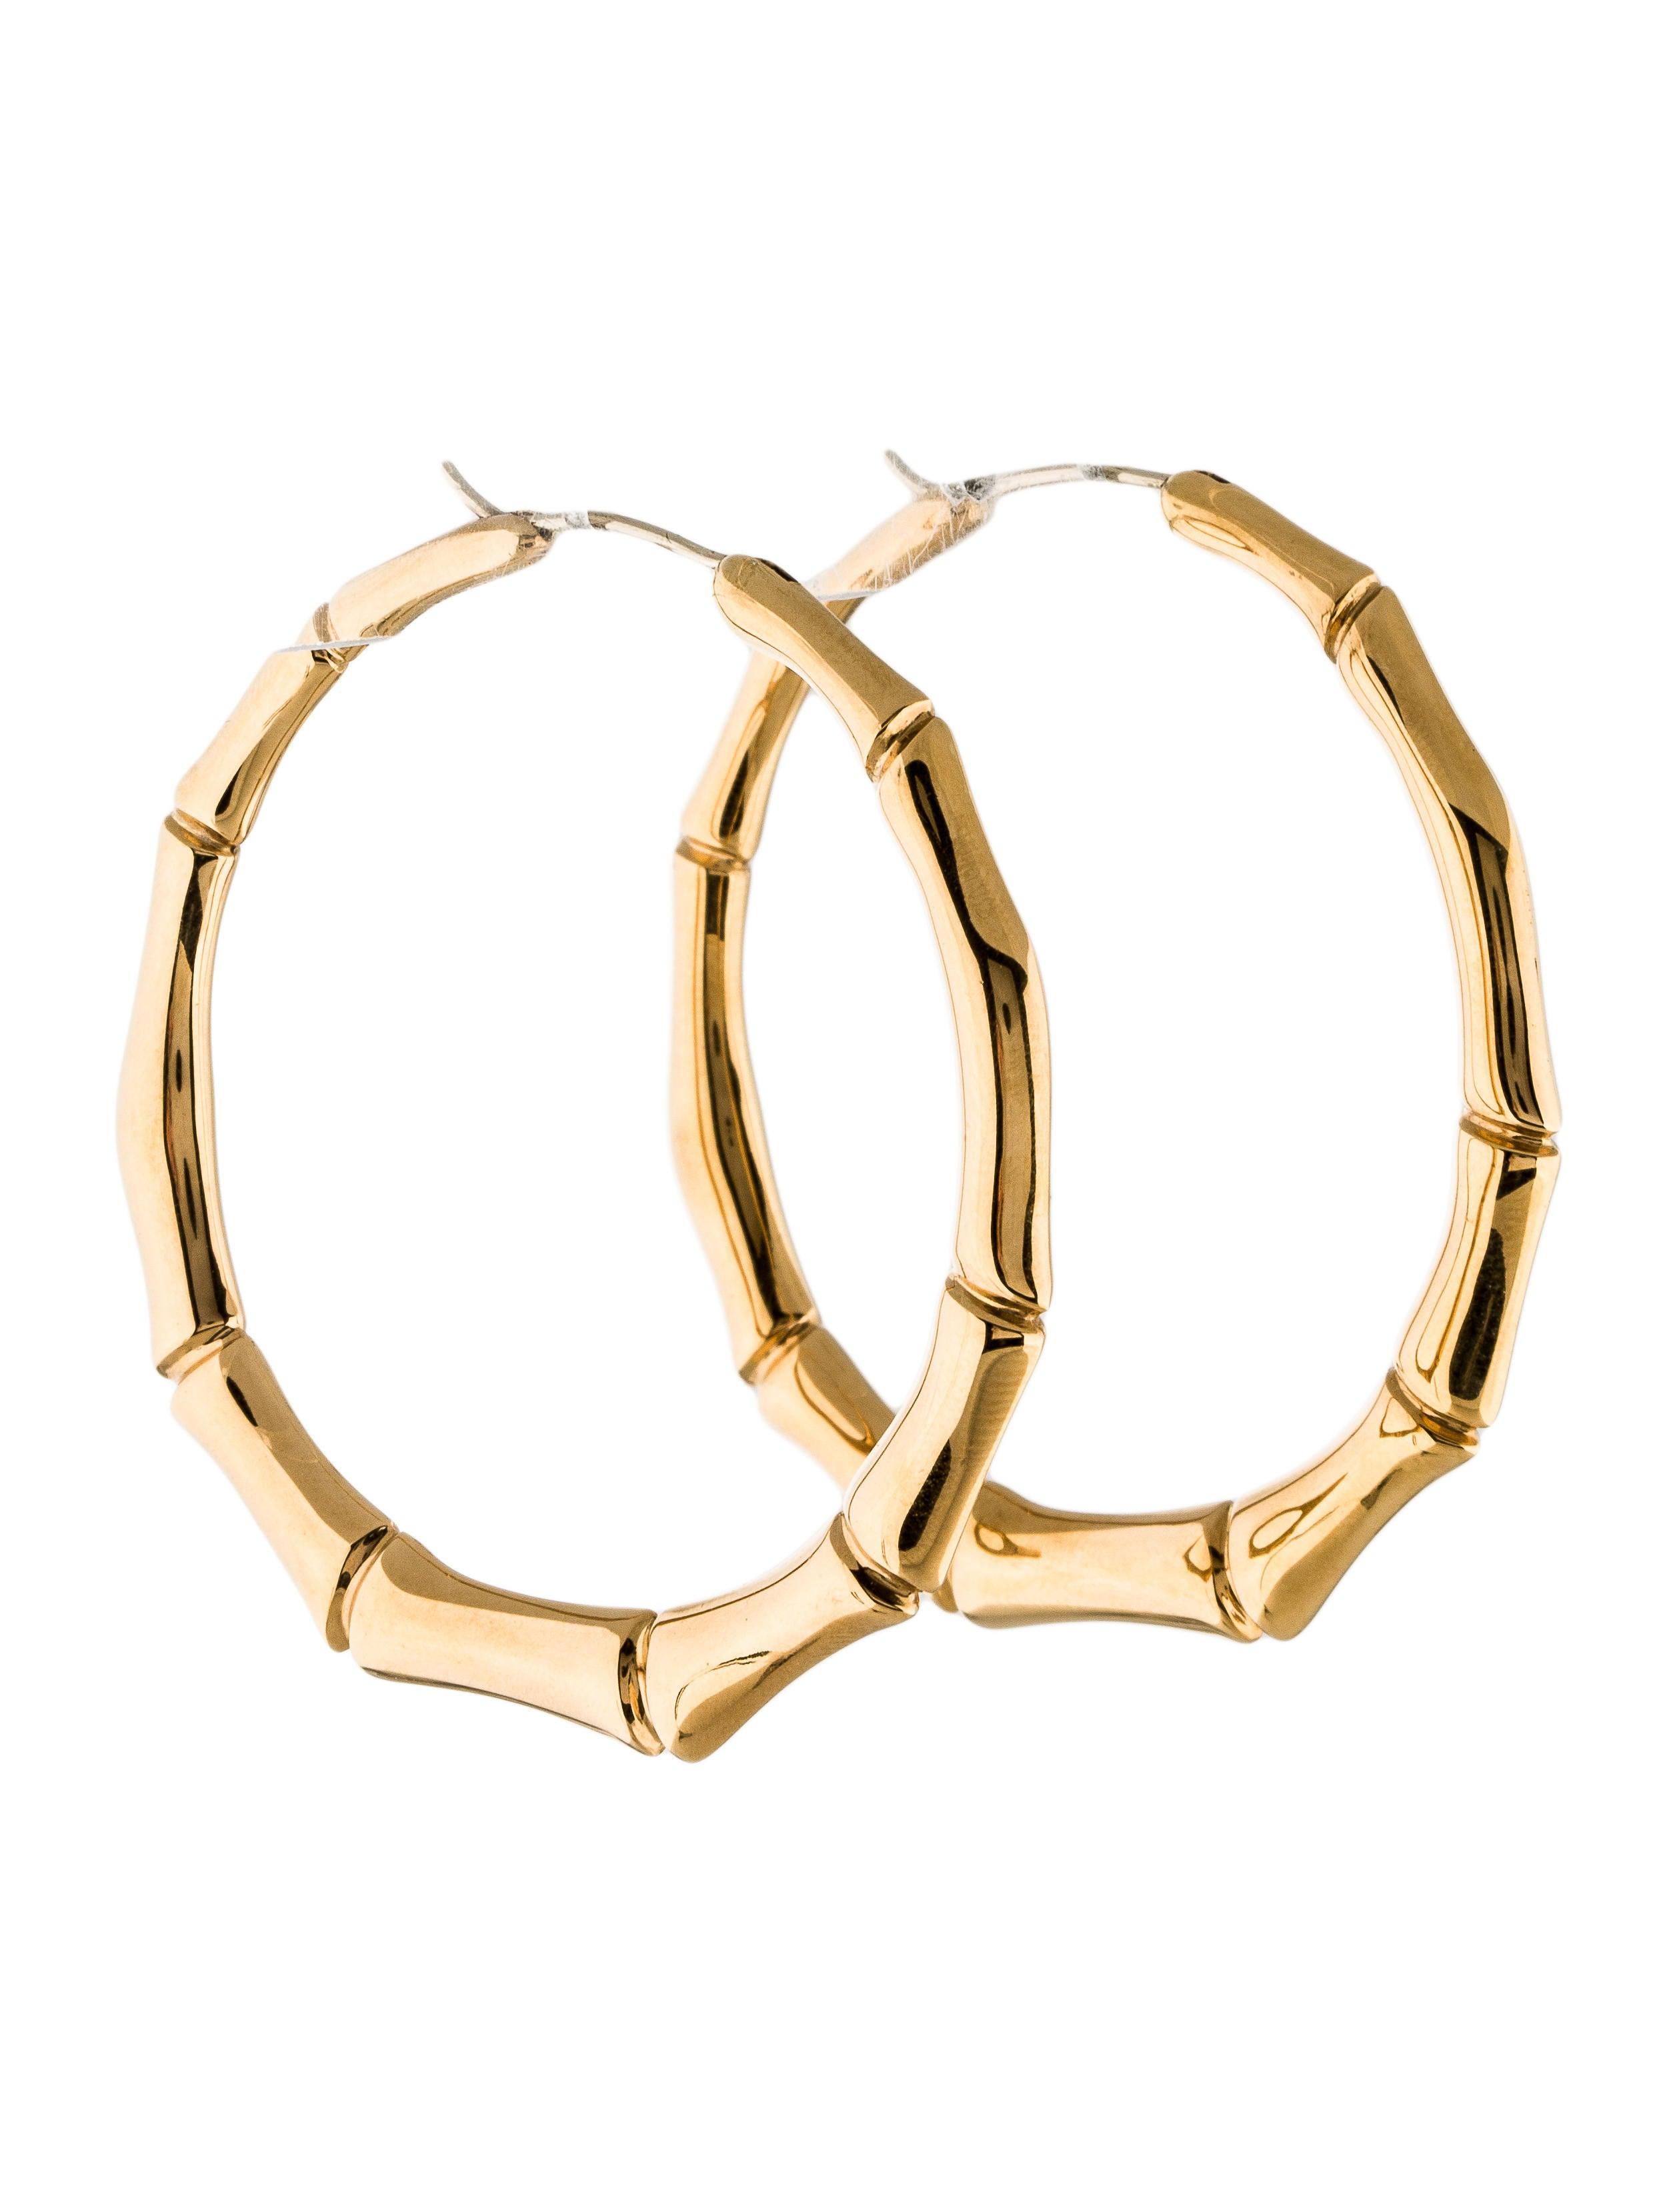 34d284fe7 Gucci 18K Bamboo Hoop Earrings - Earrings - GUC124023 | The RealReal